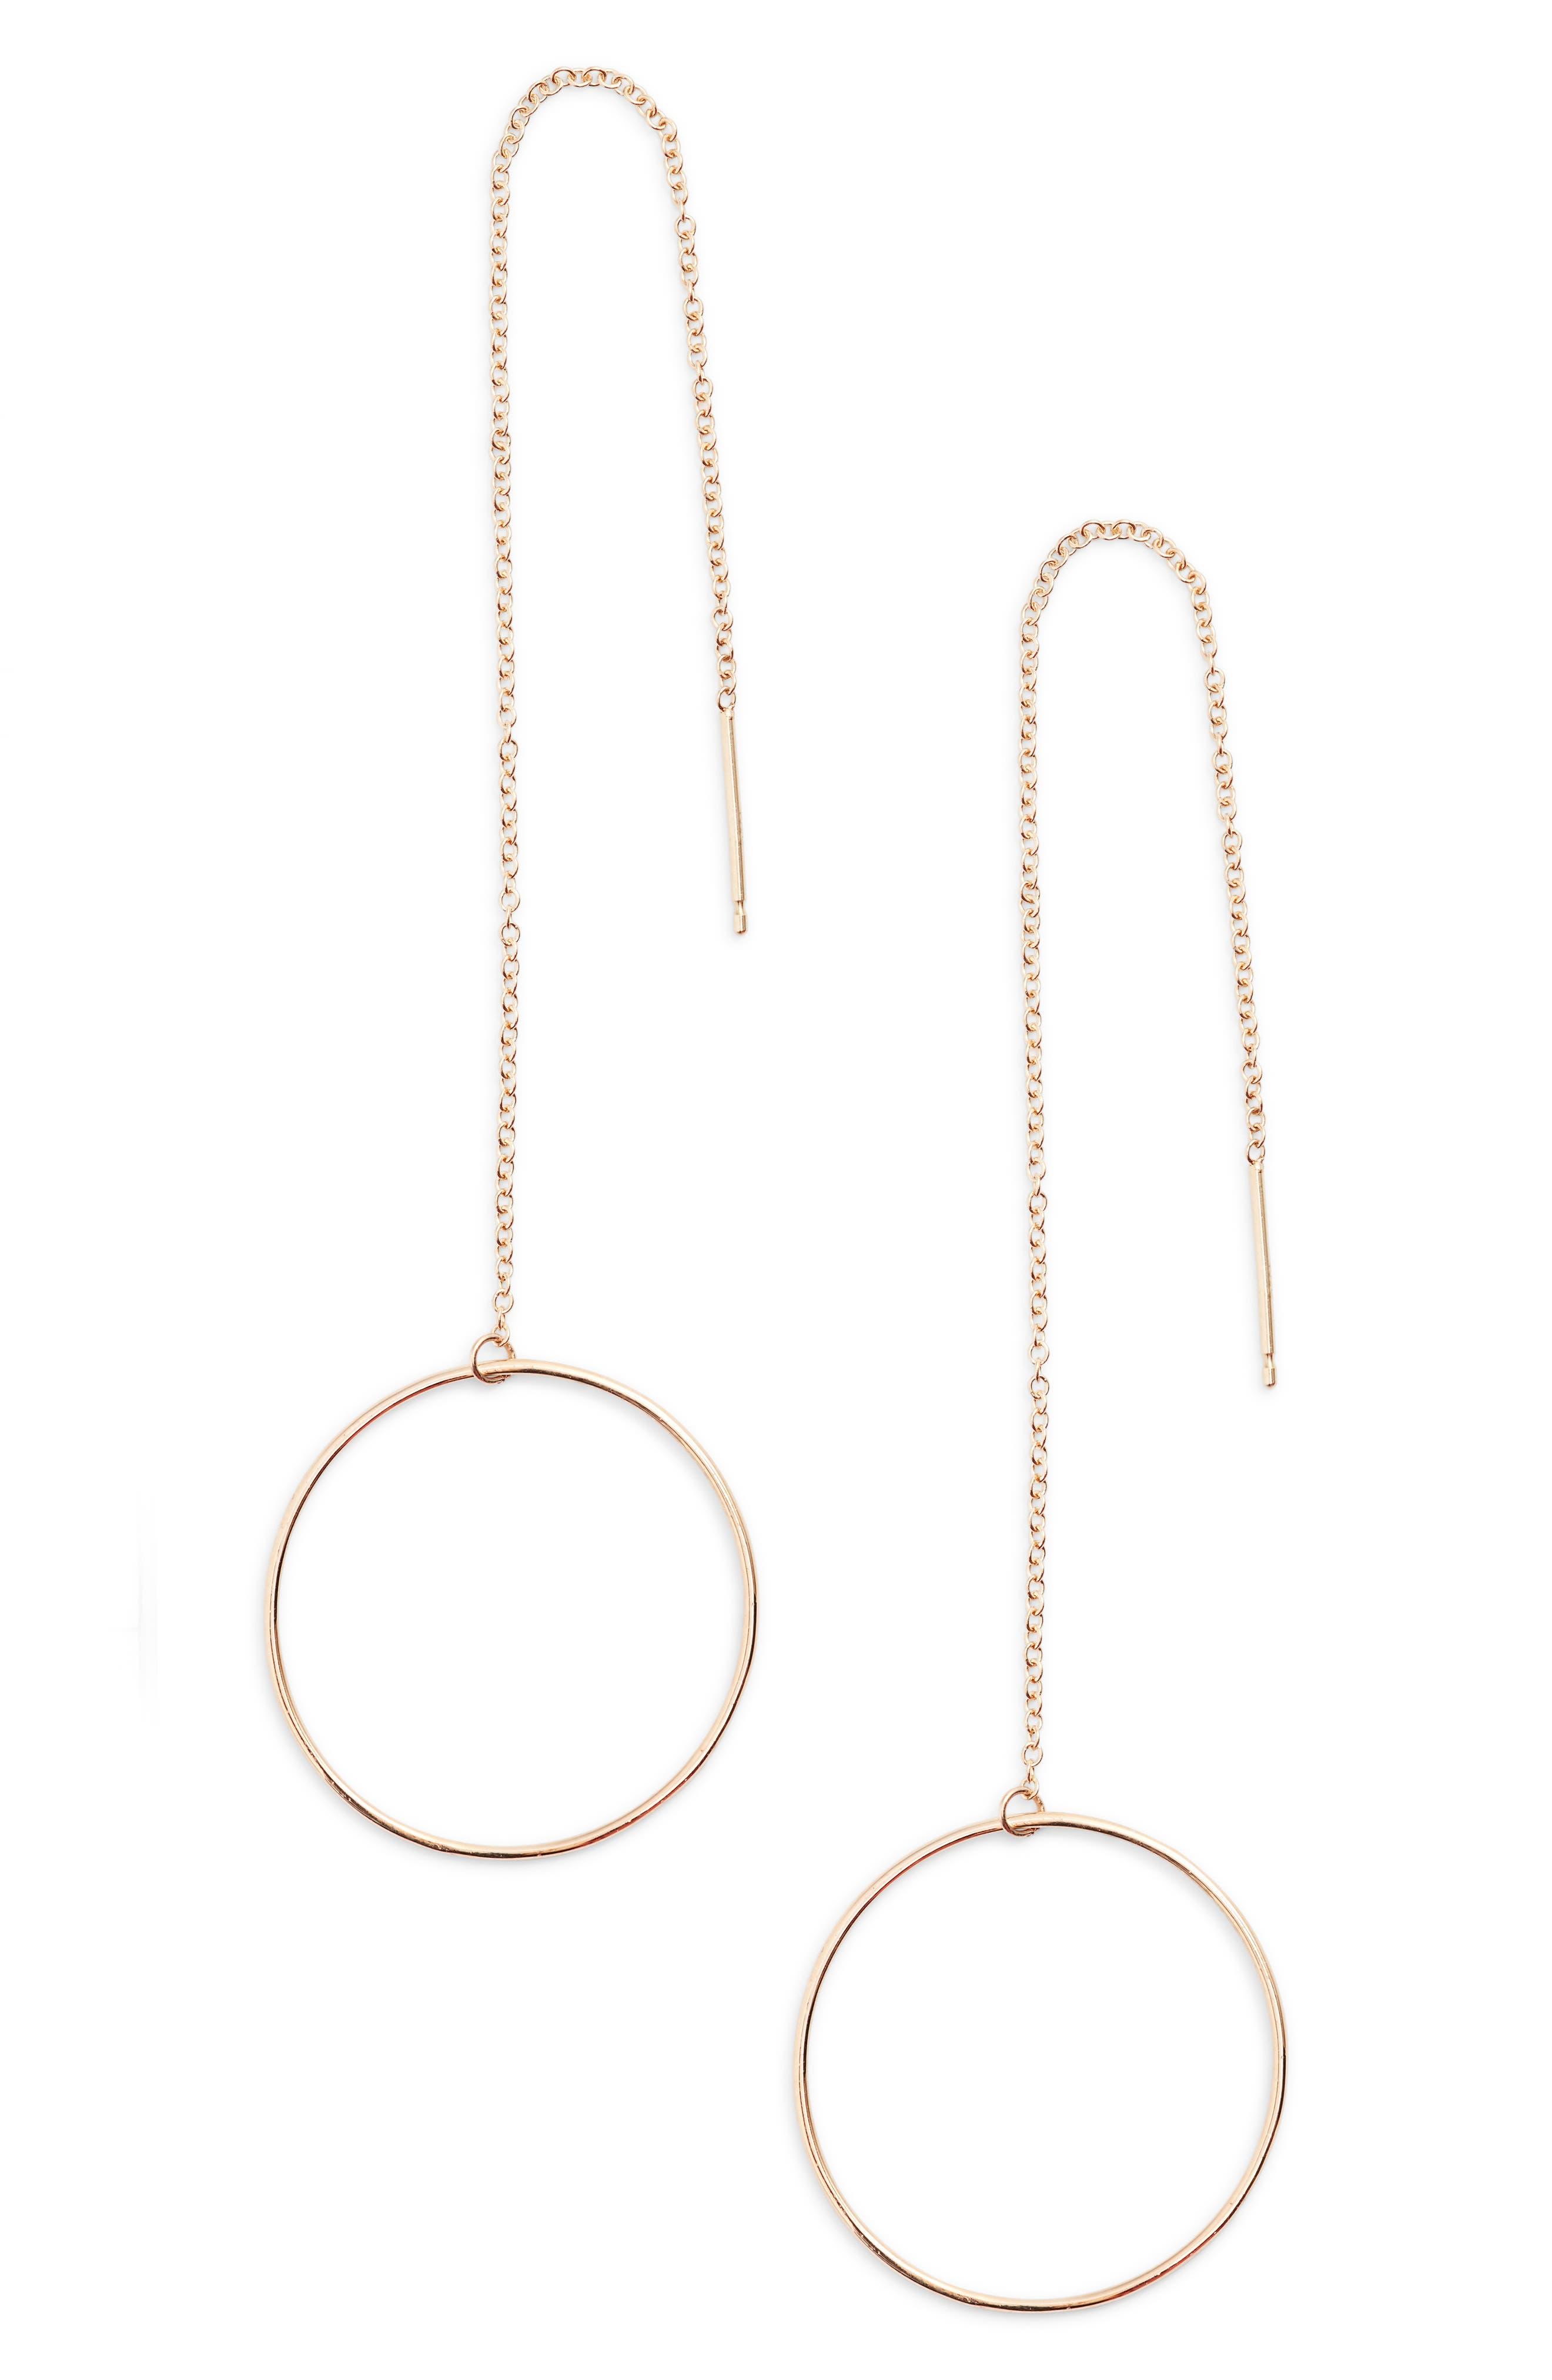 Zoe Chicco Open Circle Threader Earrings